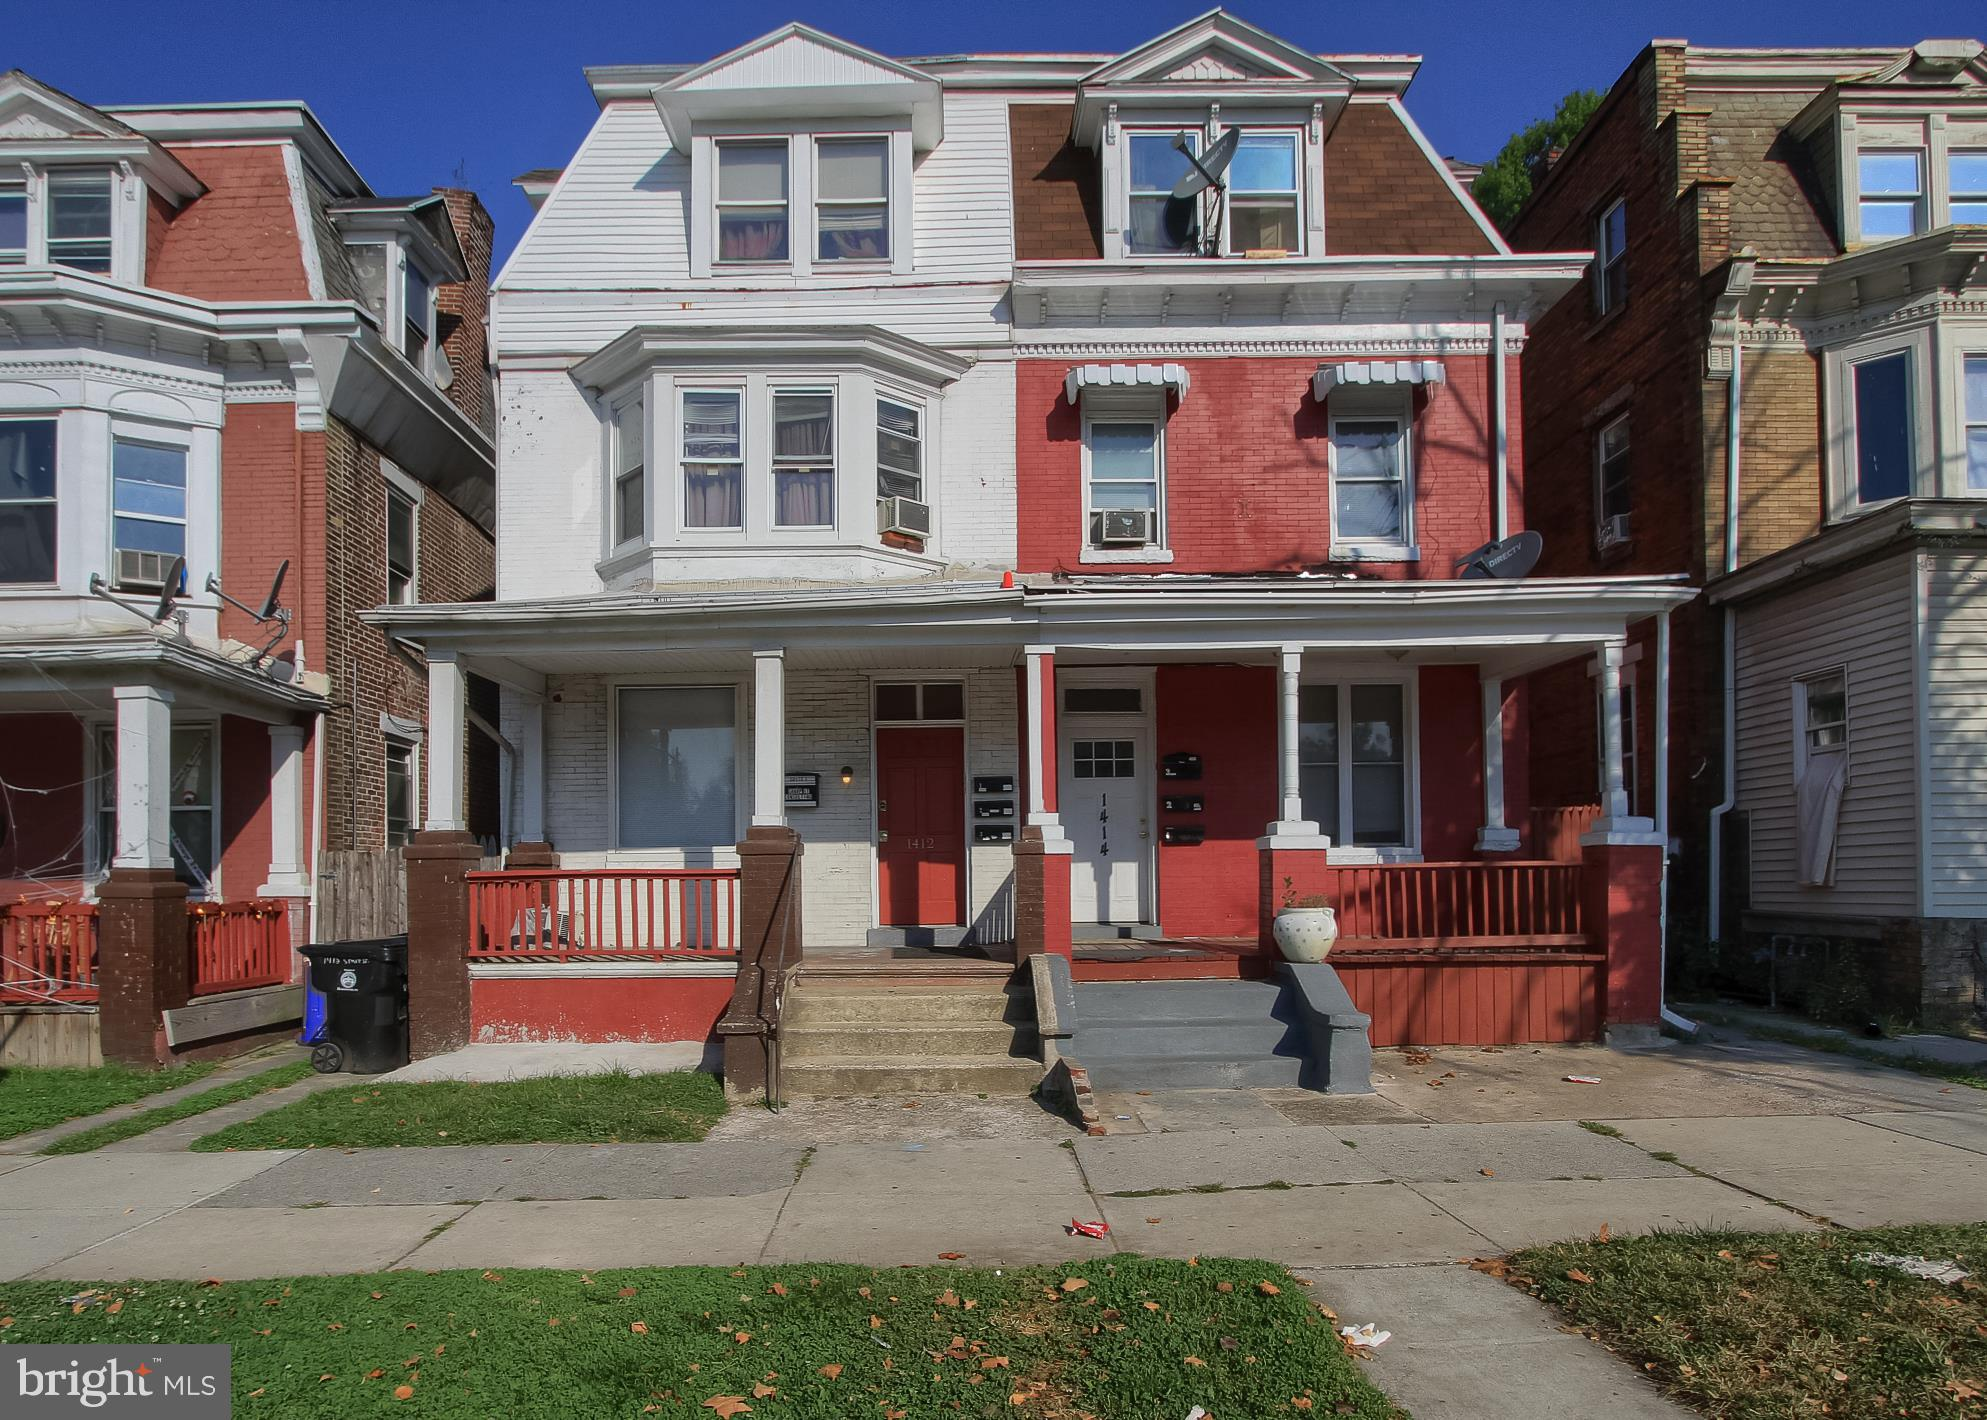 1412 STATE STREET, HARRISBURG, PA 17103